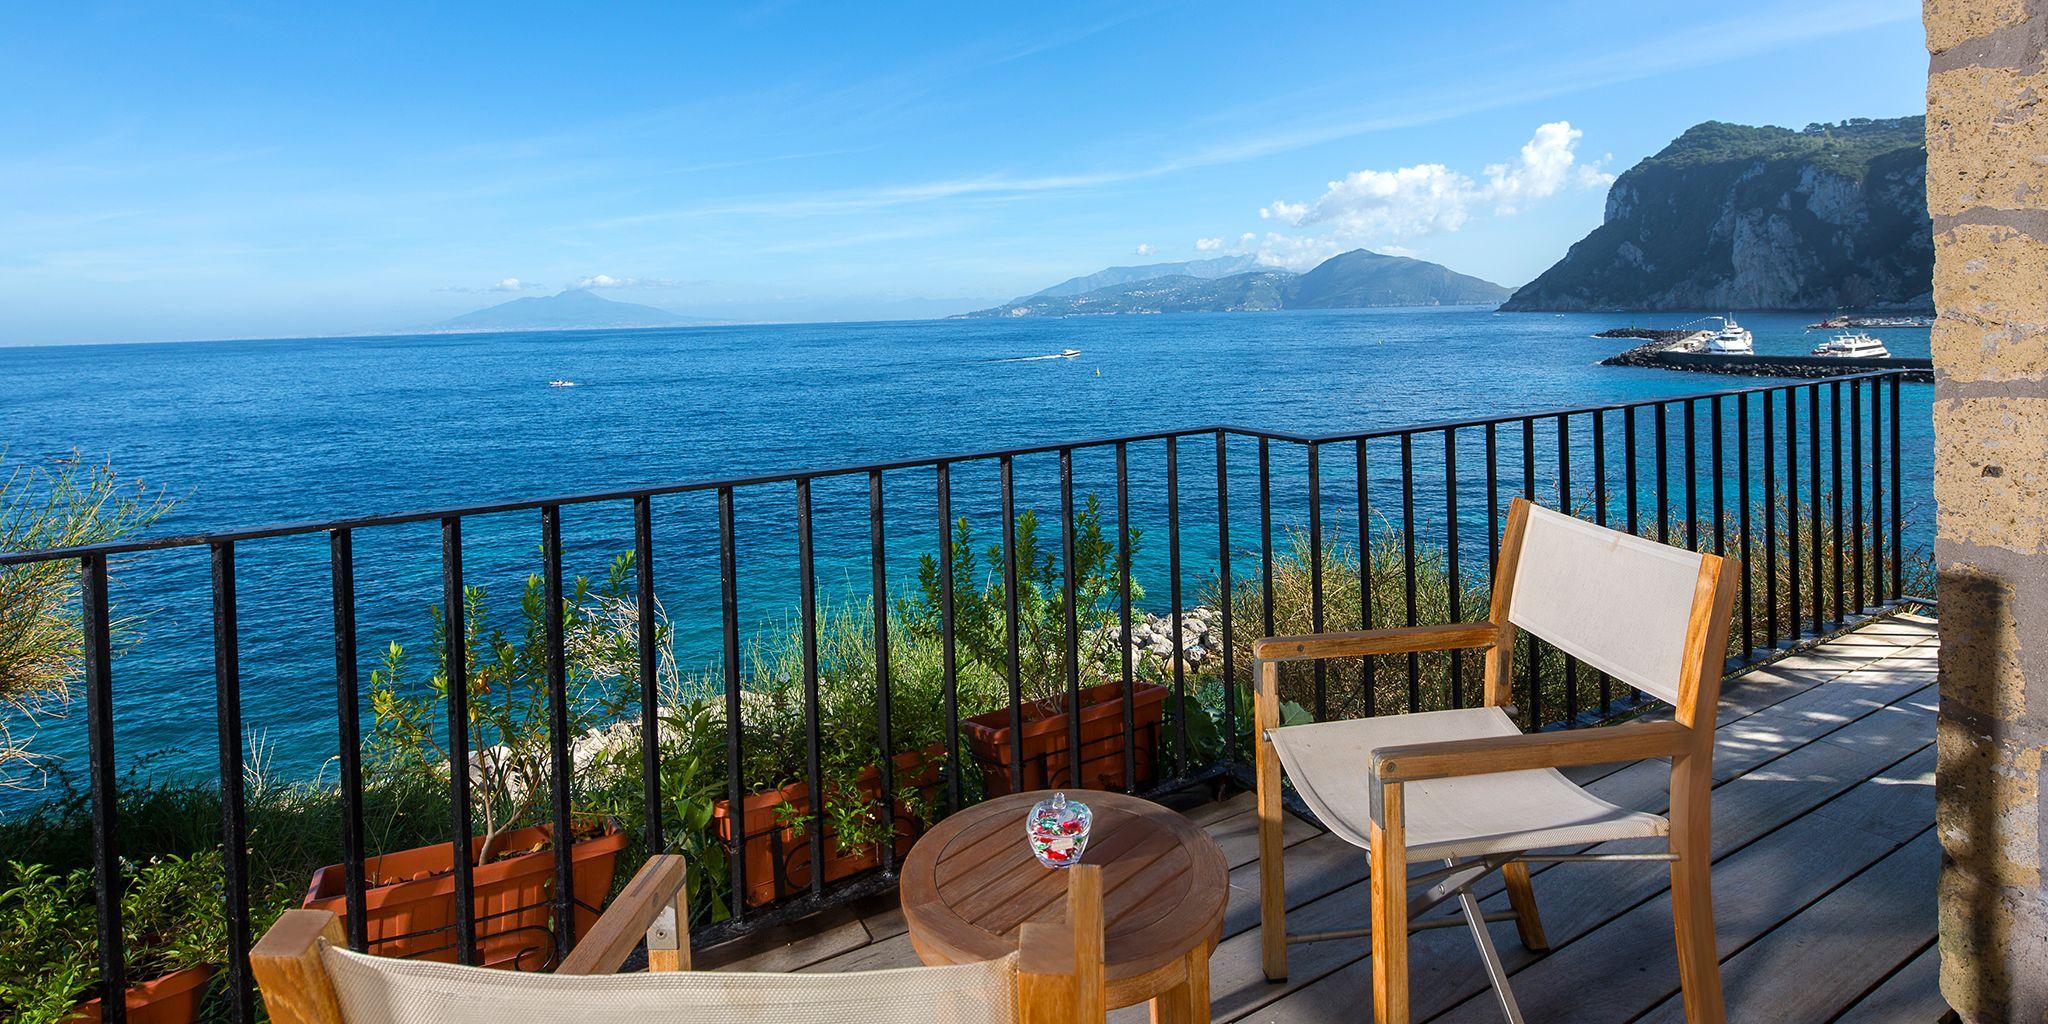 The Beautiful Island of Capri Italy - eTravelTrips.com |Capri Italy Golf